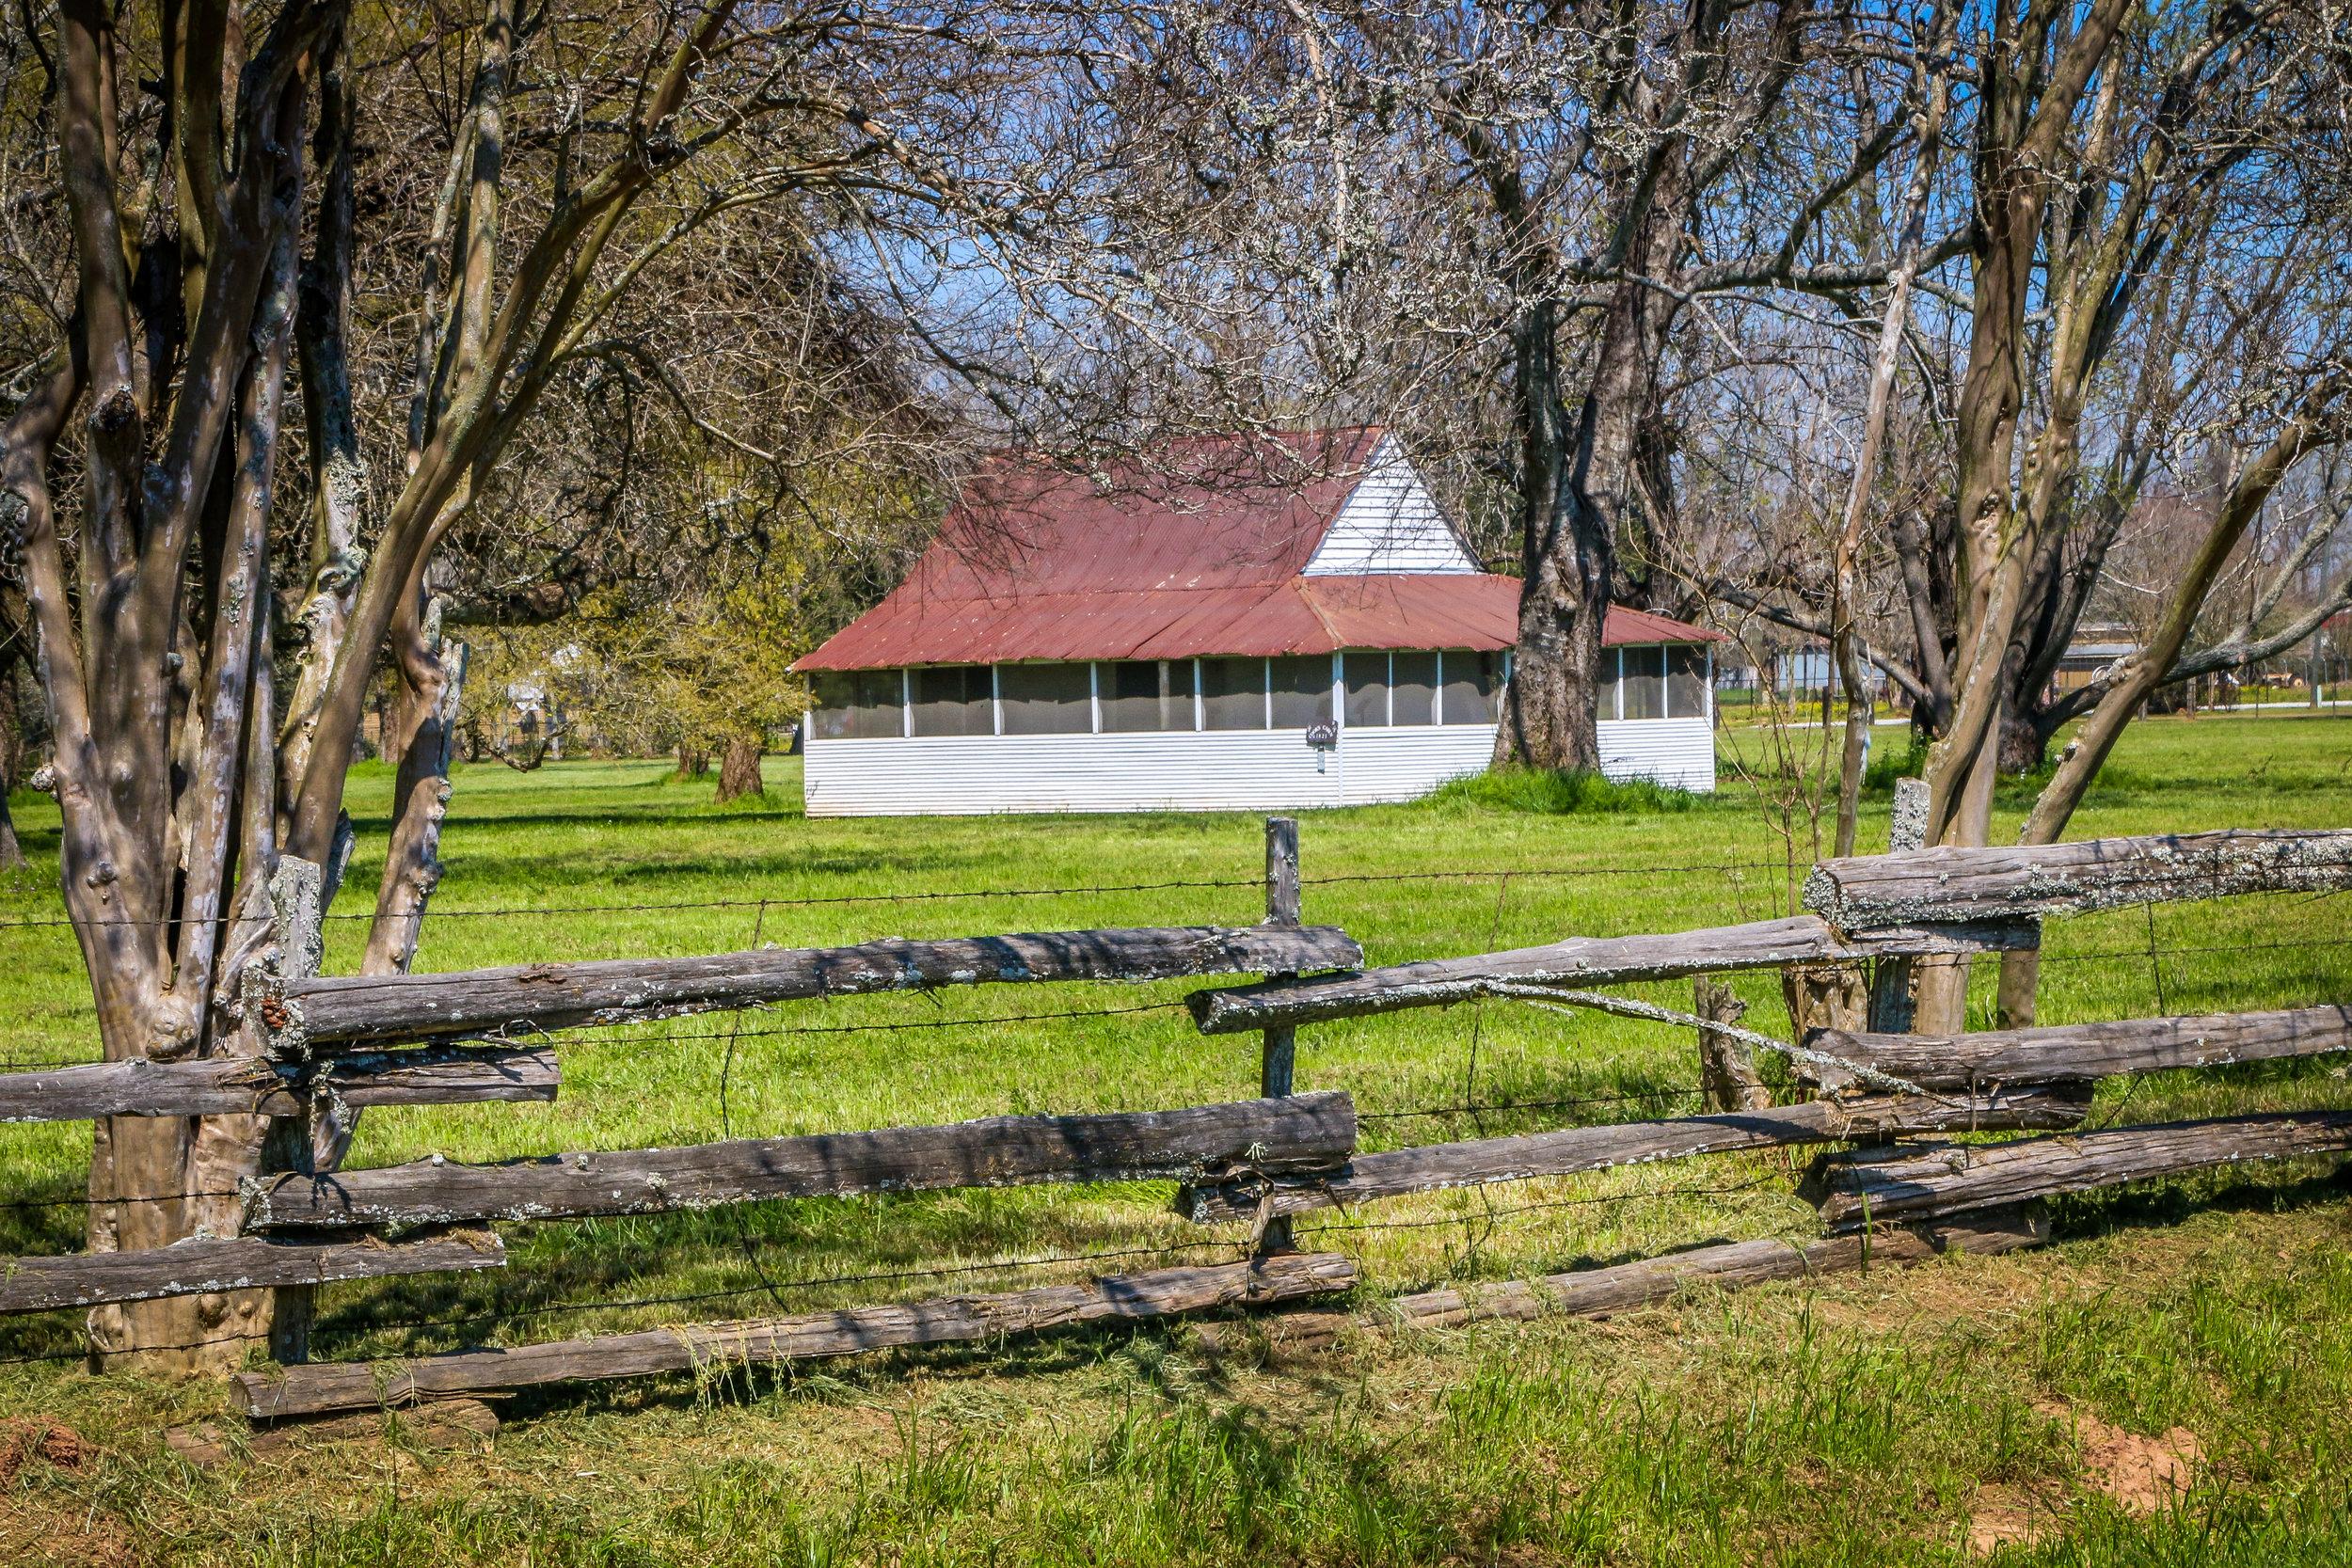 oakland plantation cane river creole national historic site louisiana nps